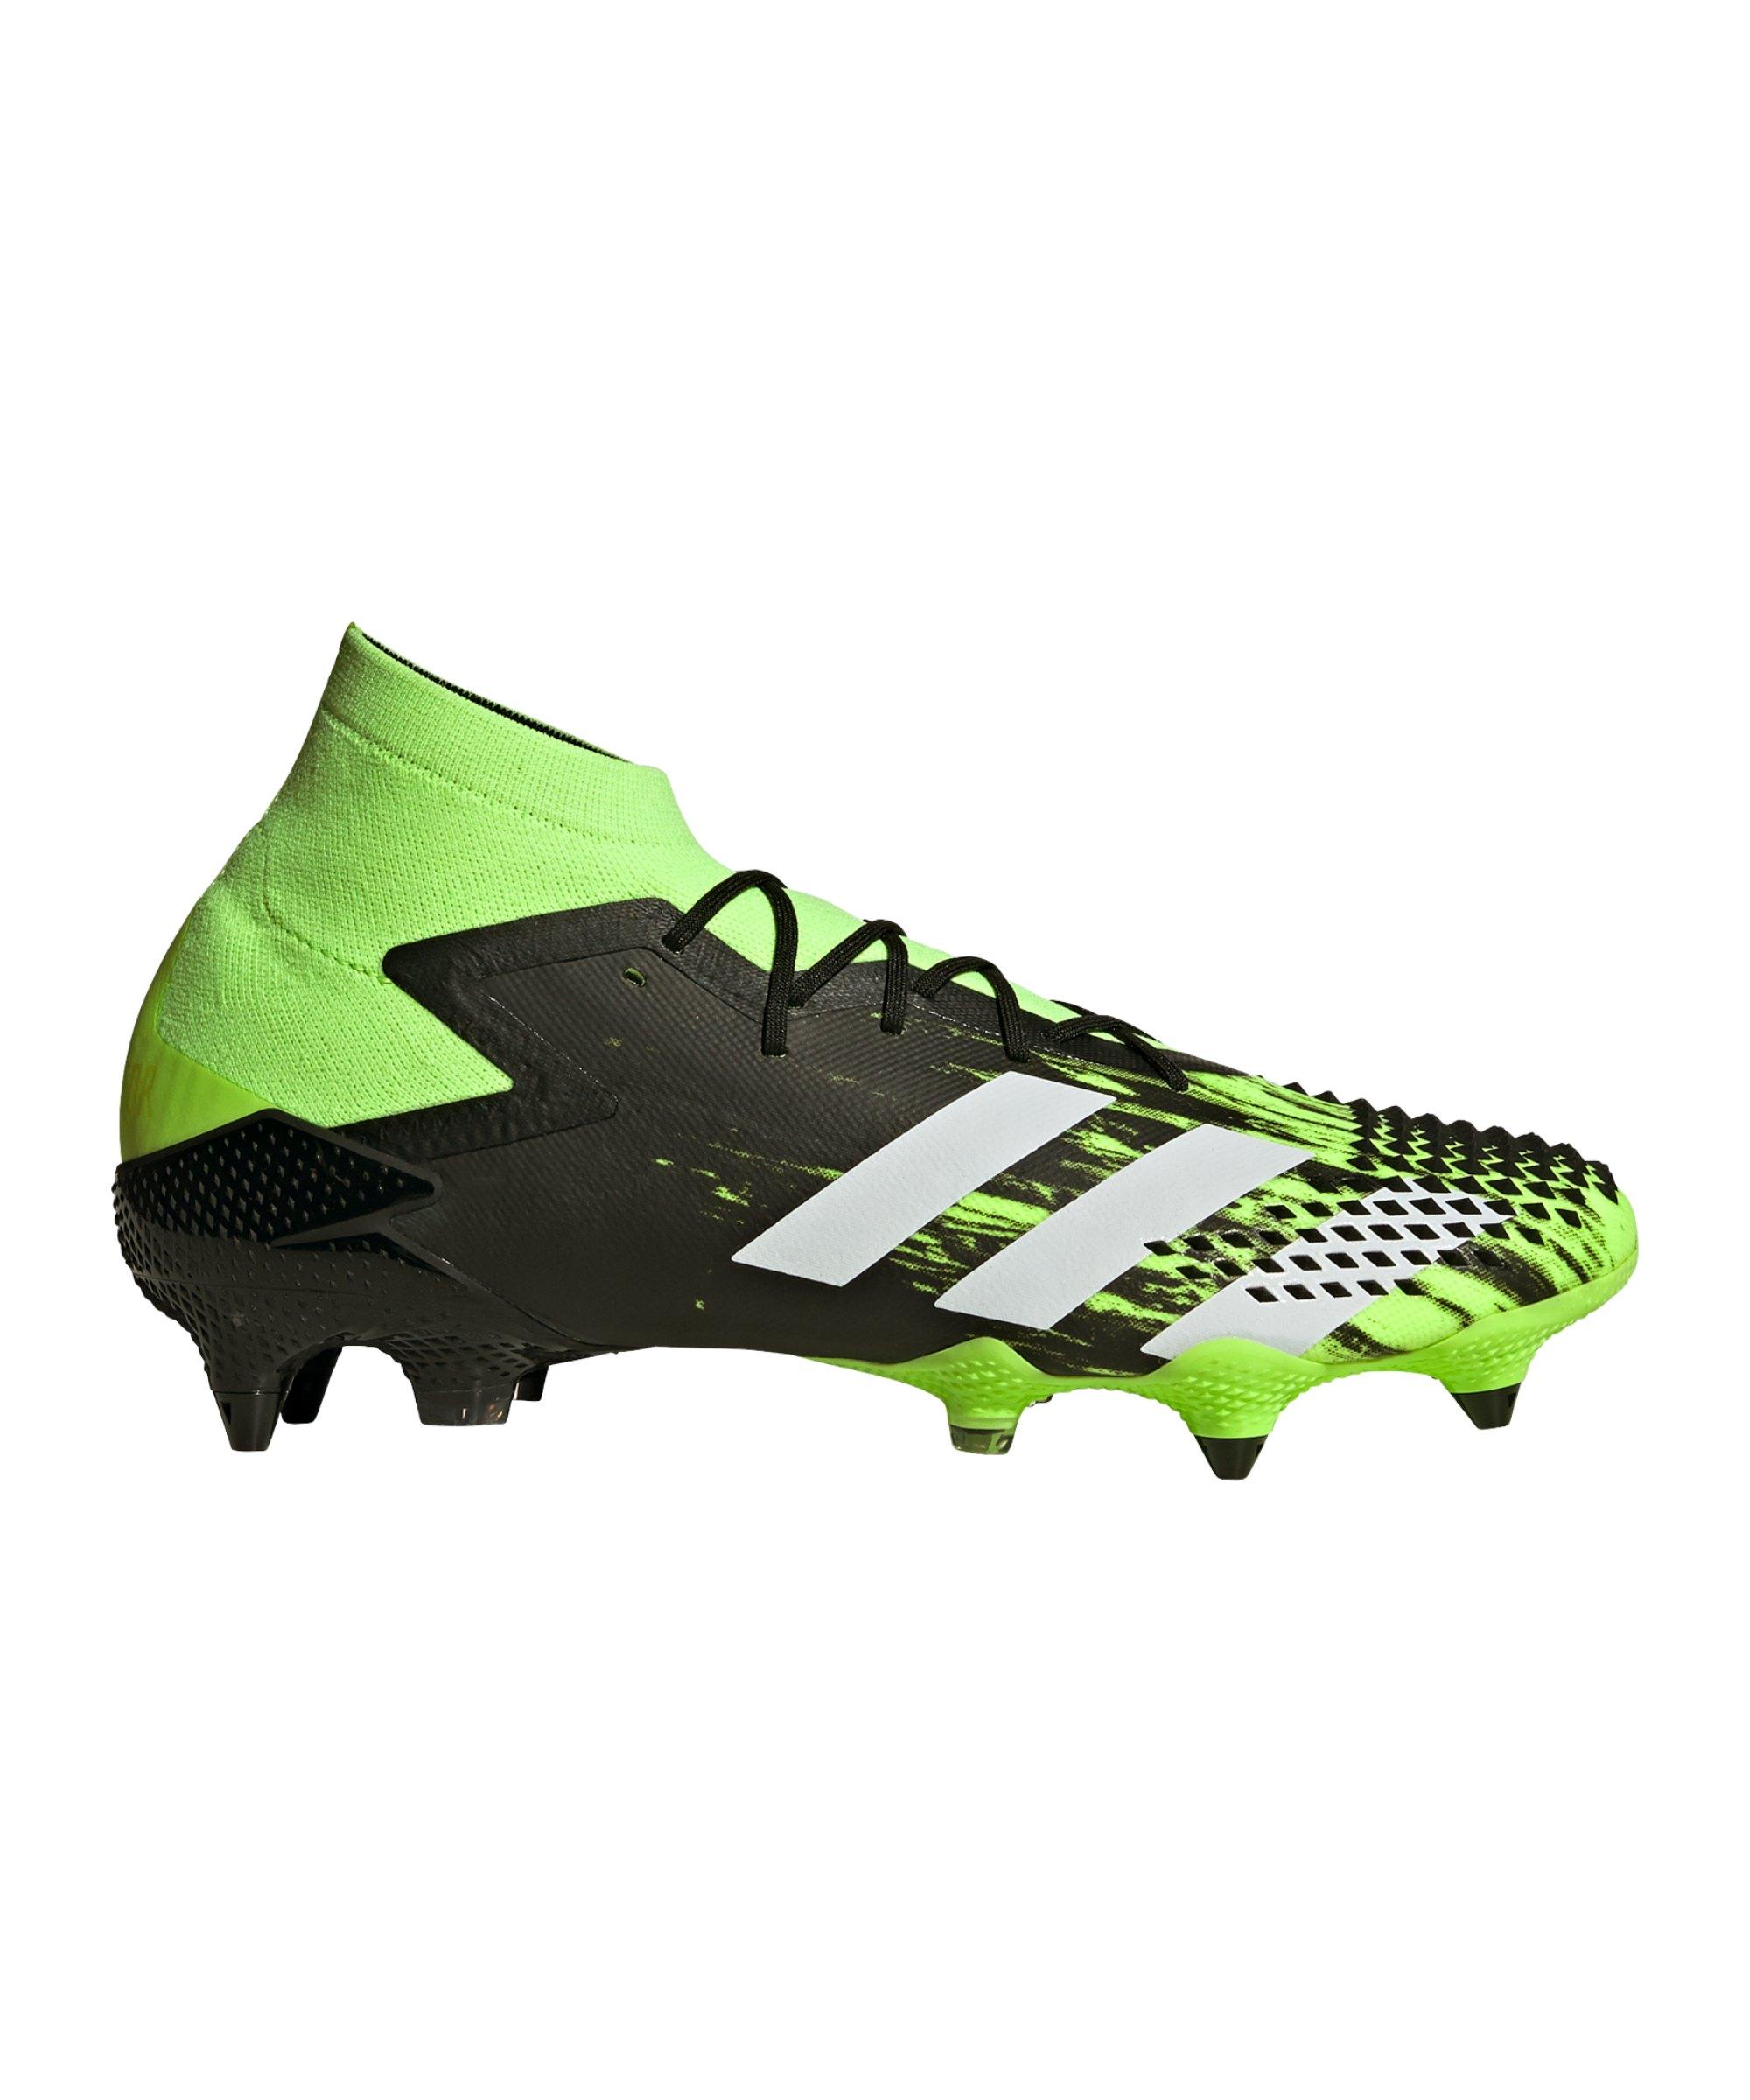 adidas Predator Precision to Blur 20.1 SG Grün Weiss - gruen